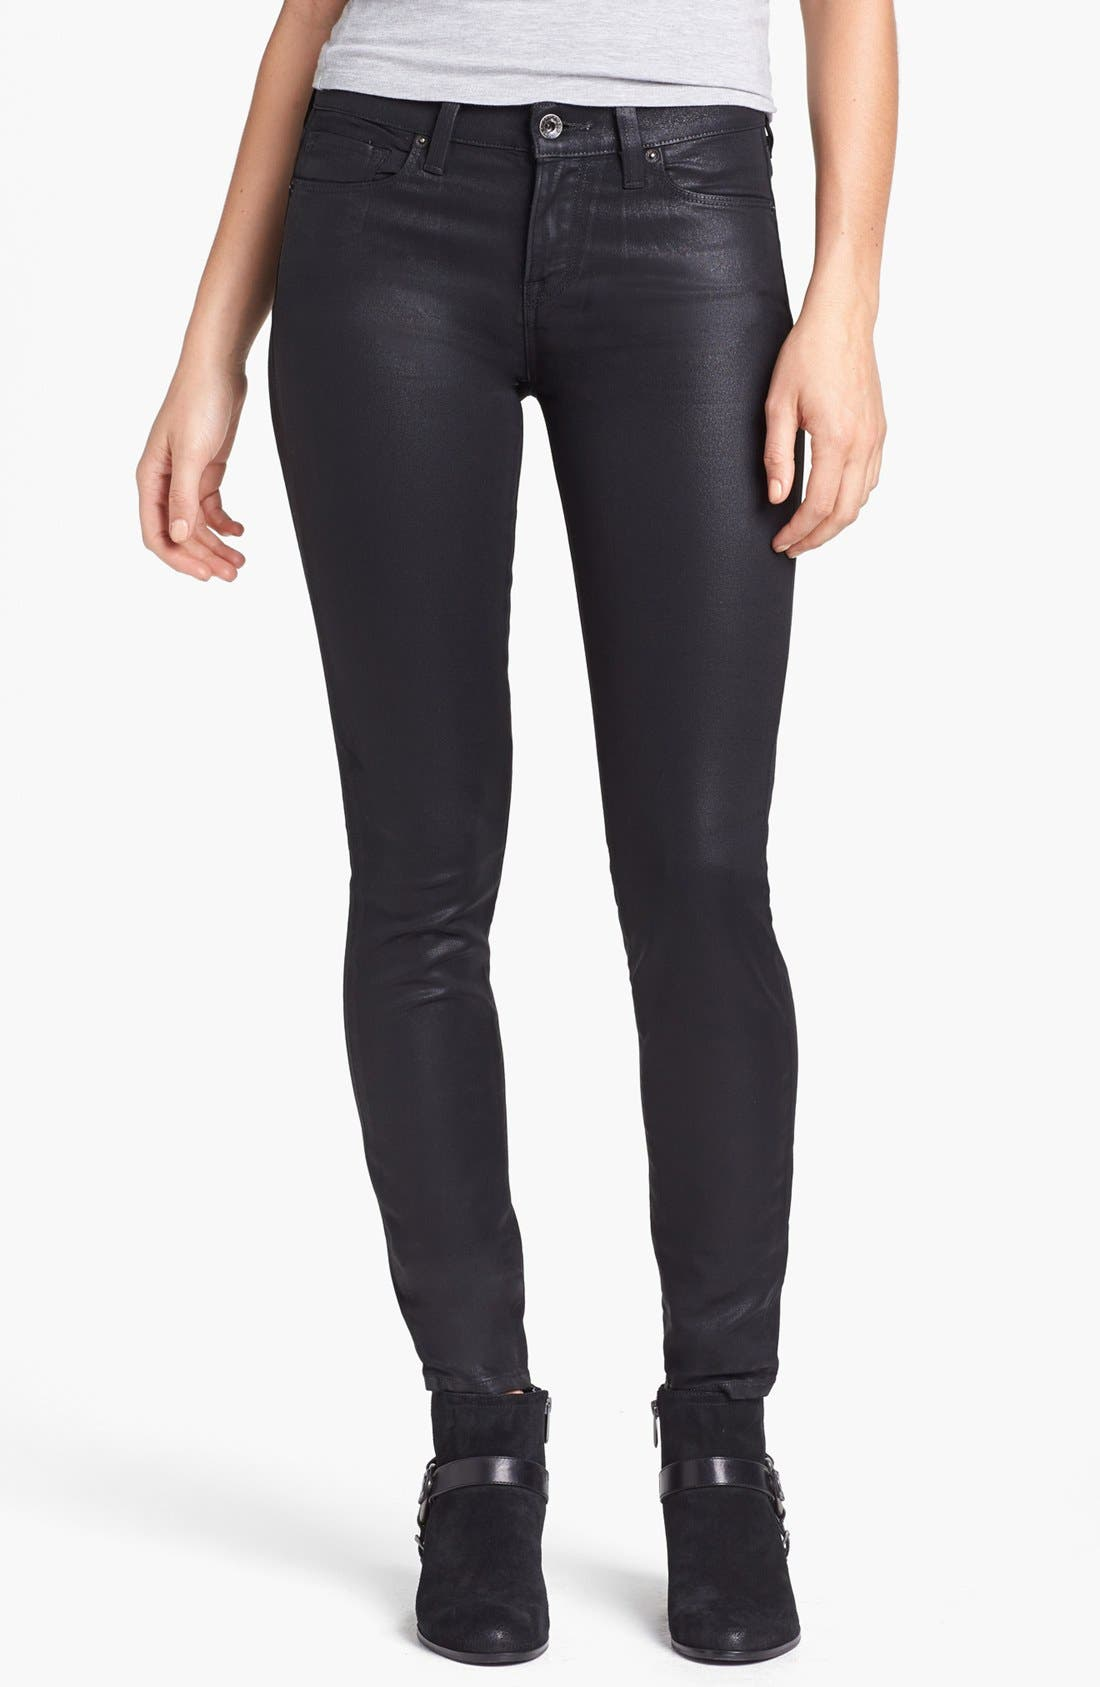 Main Image - Lucky Brand 'Sofia' Coated Skinny Jeans (Black)